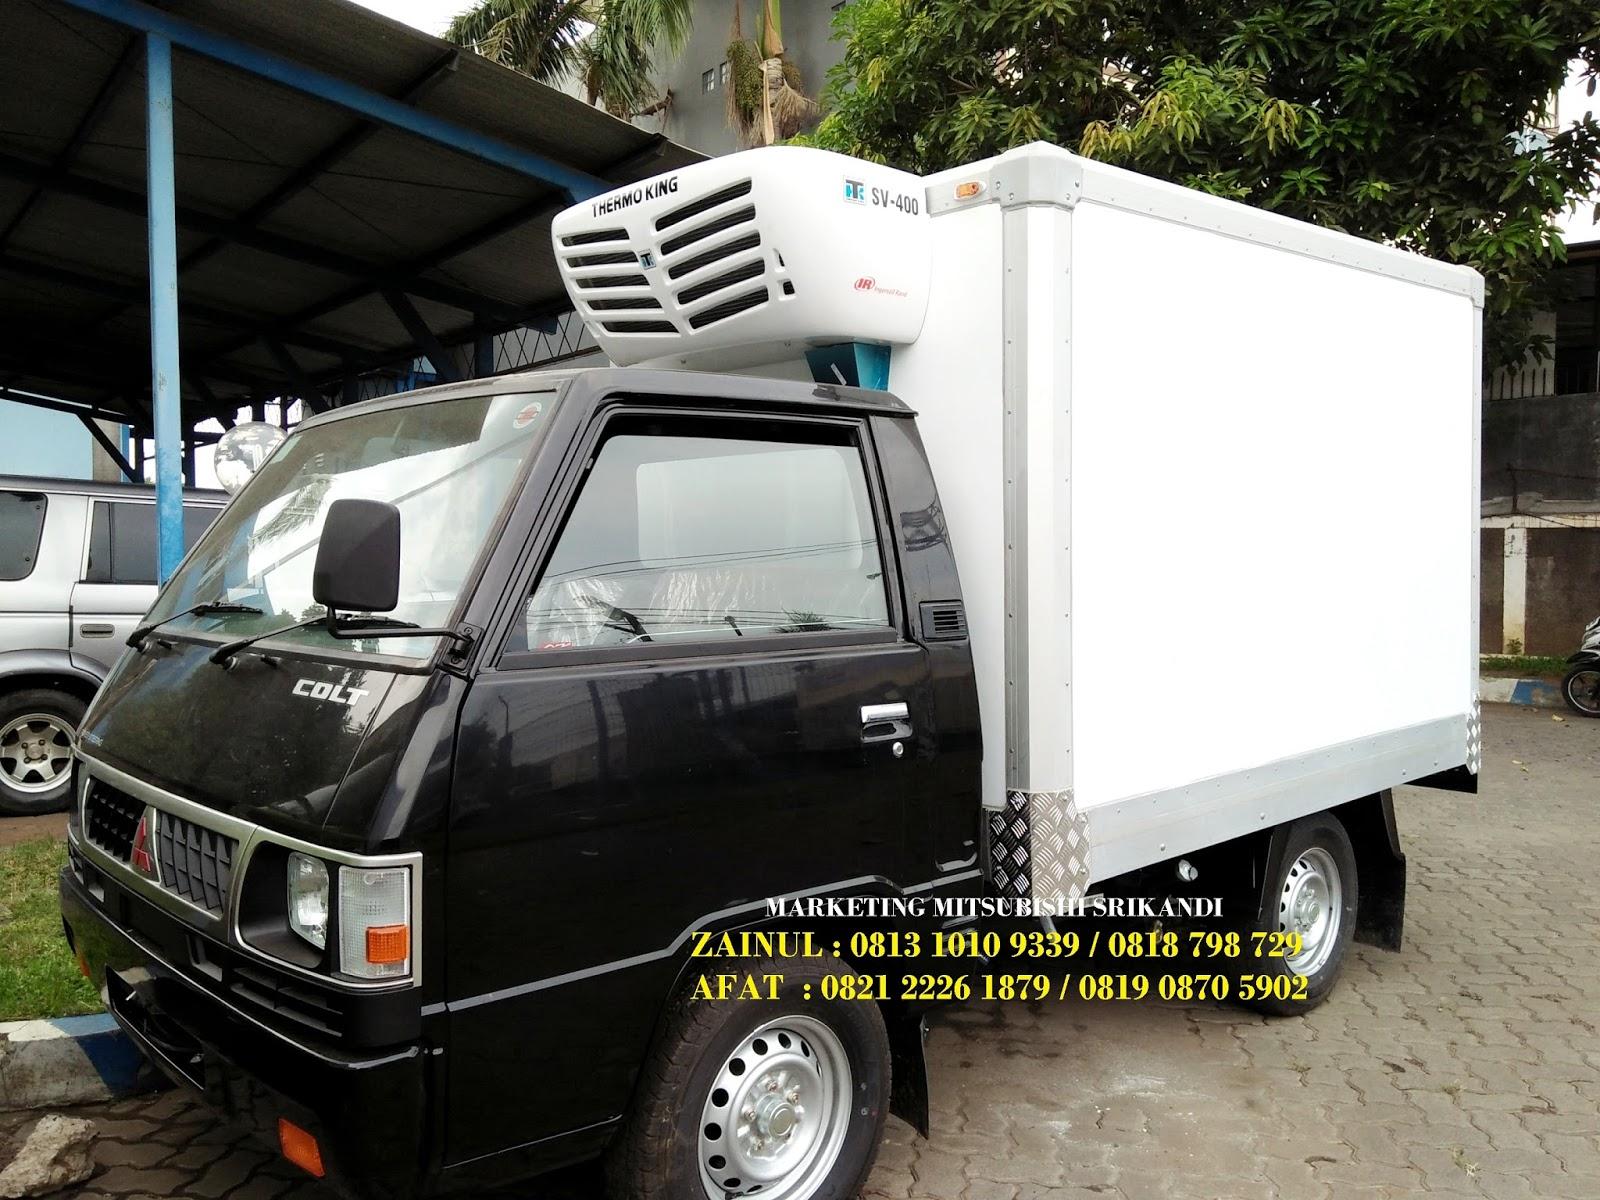 Dealer Mitsubishi Niaga Dki Jakarta : Harga colt diesel ...